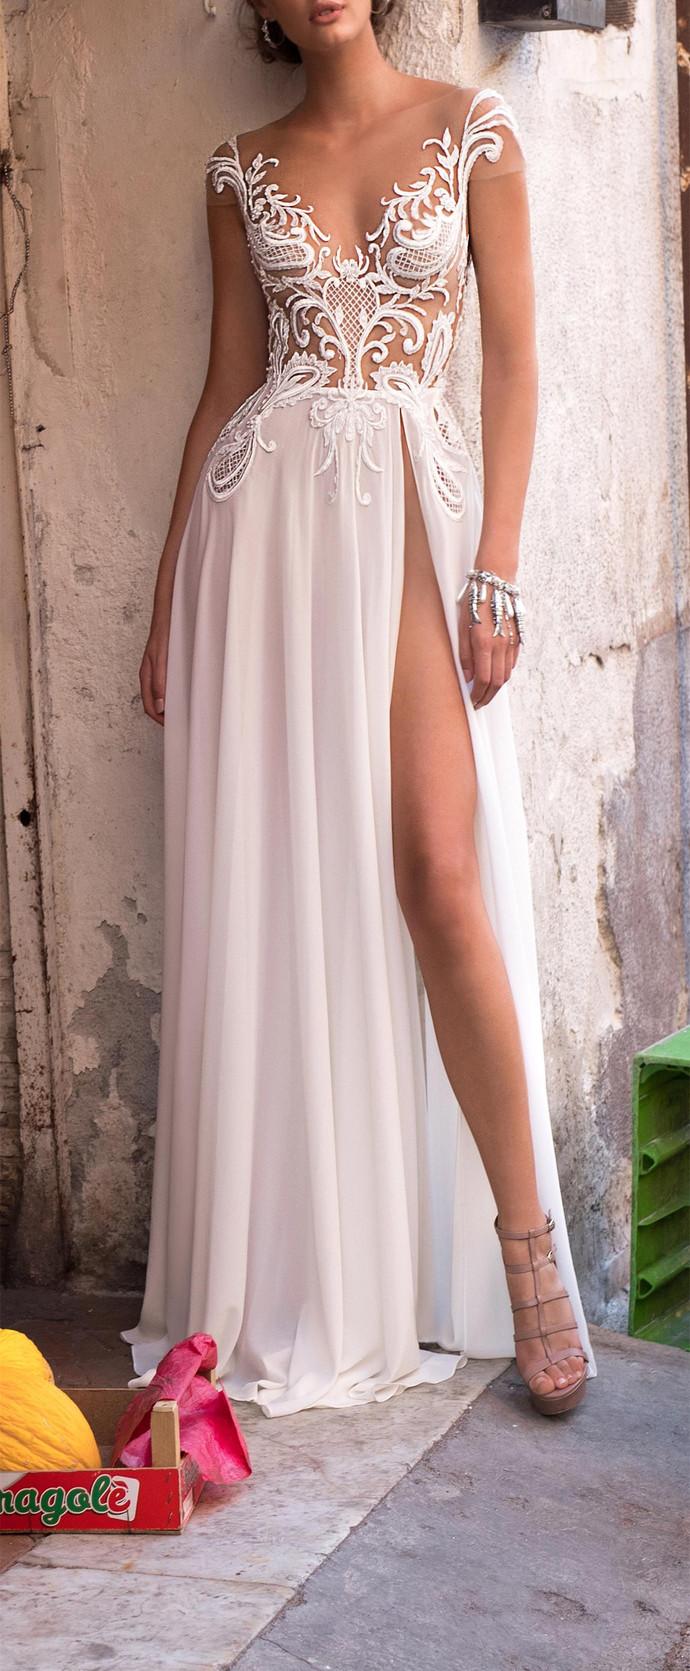 Elegant White Lace Chiffon Wedding Dress,Off by dresses on Zibbet